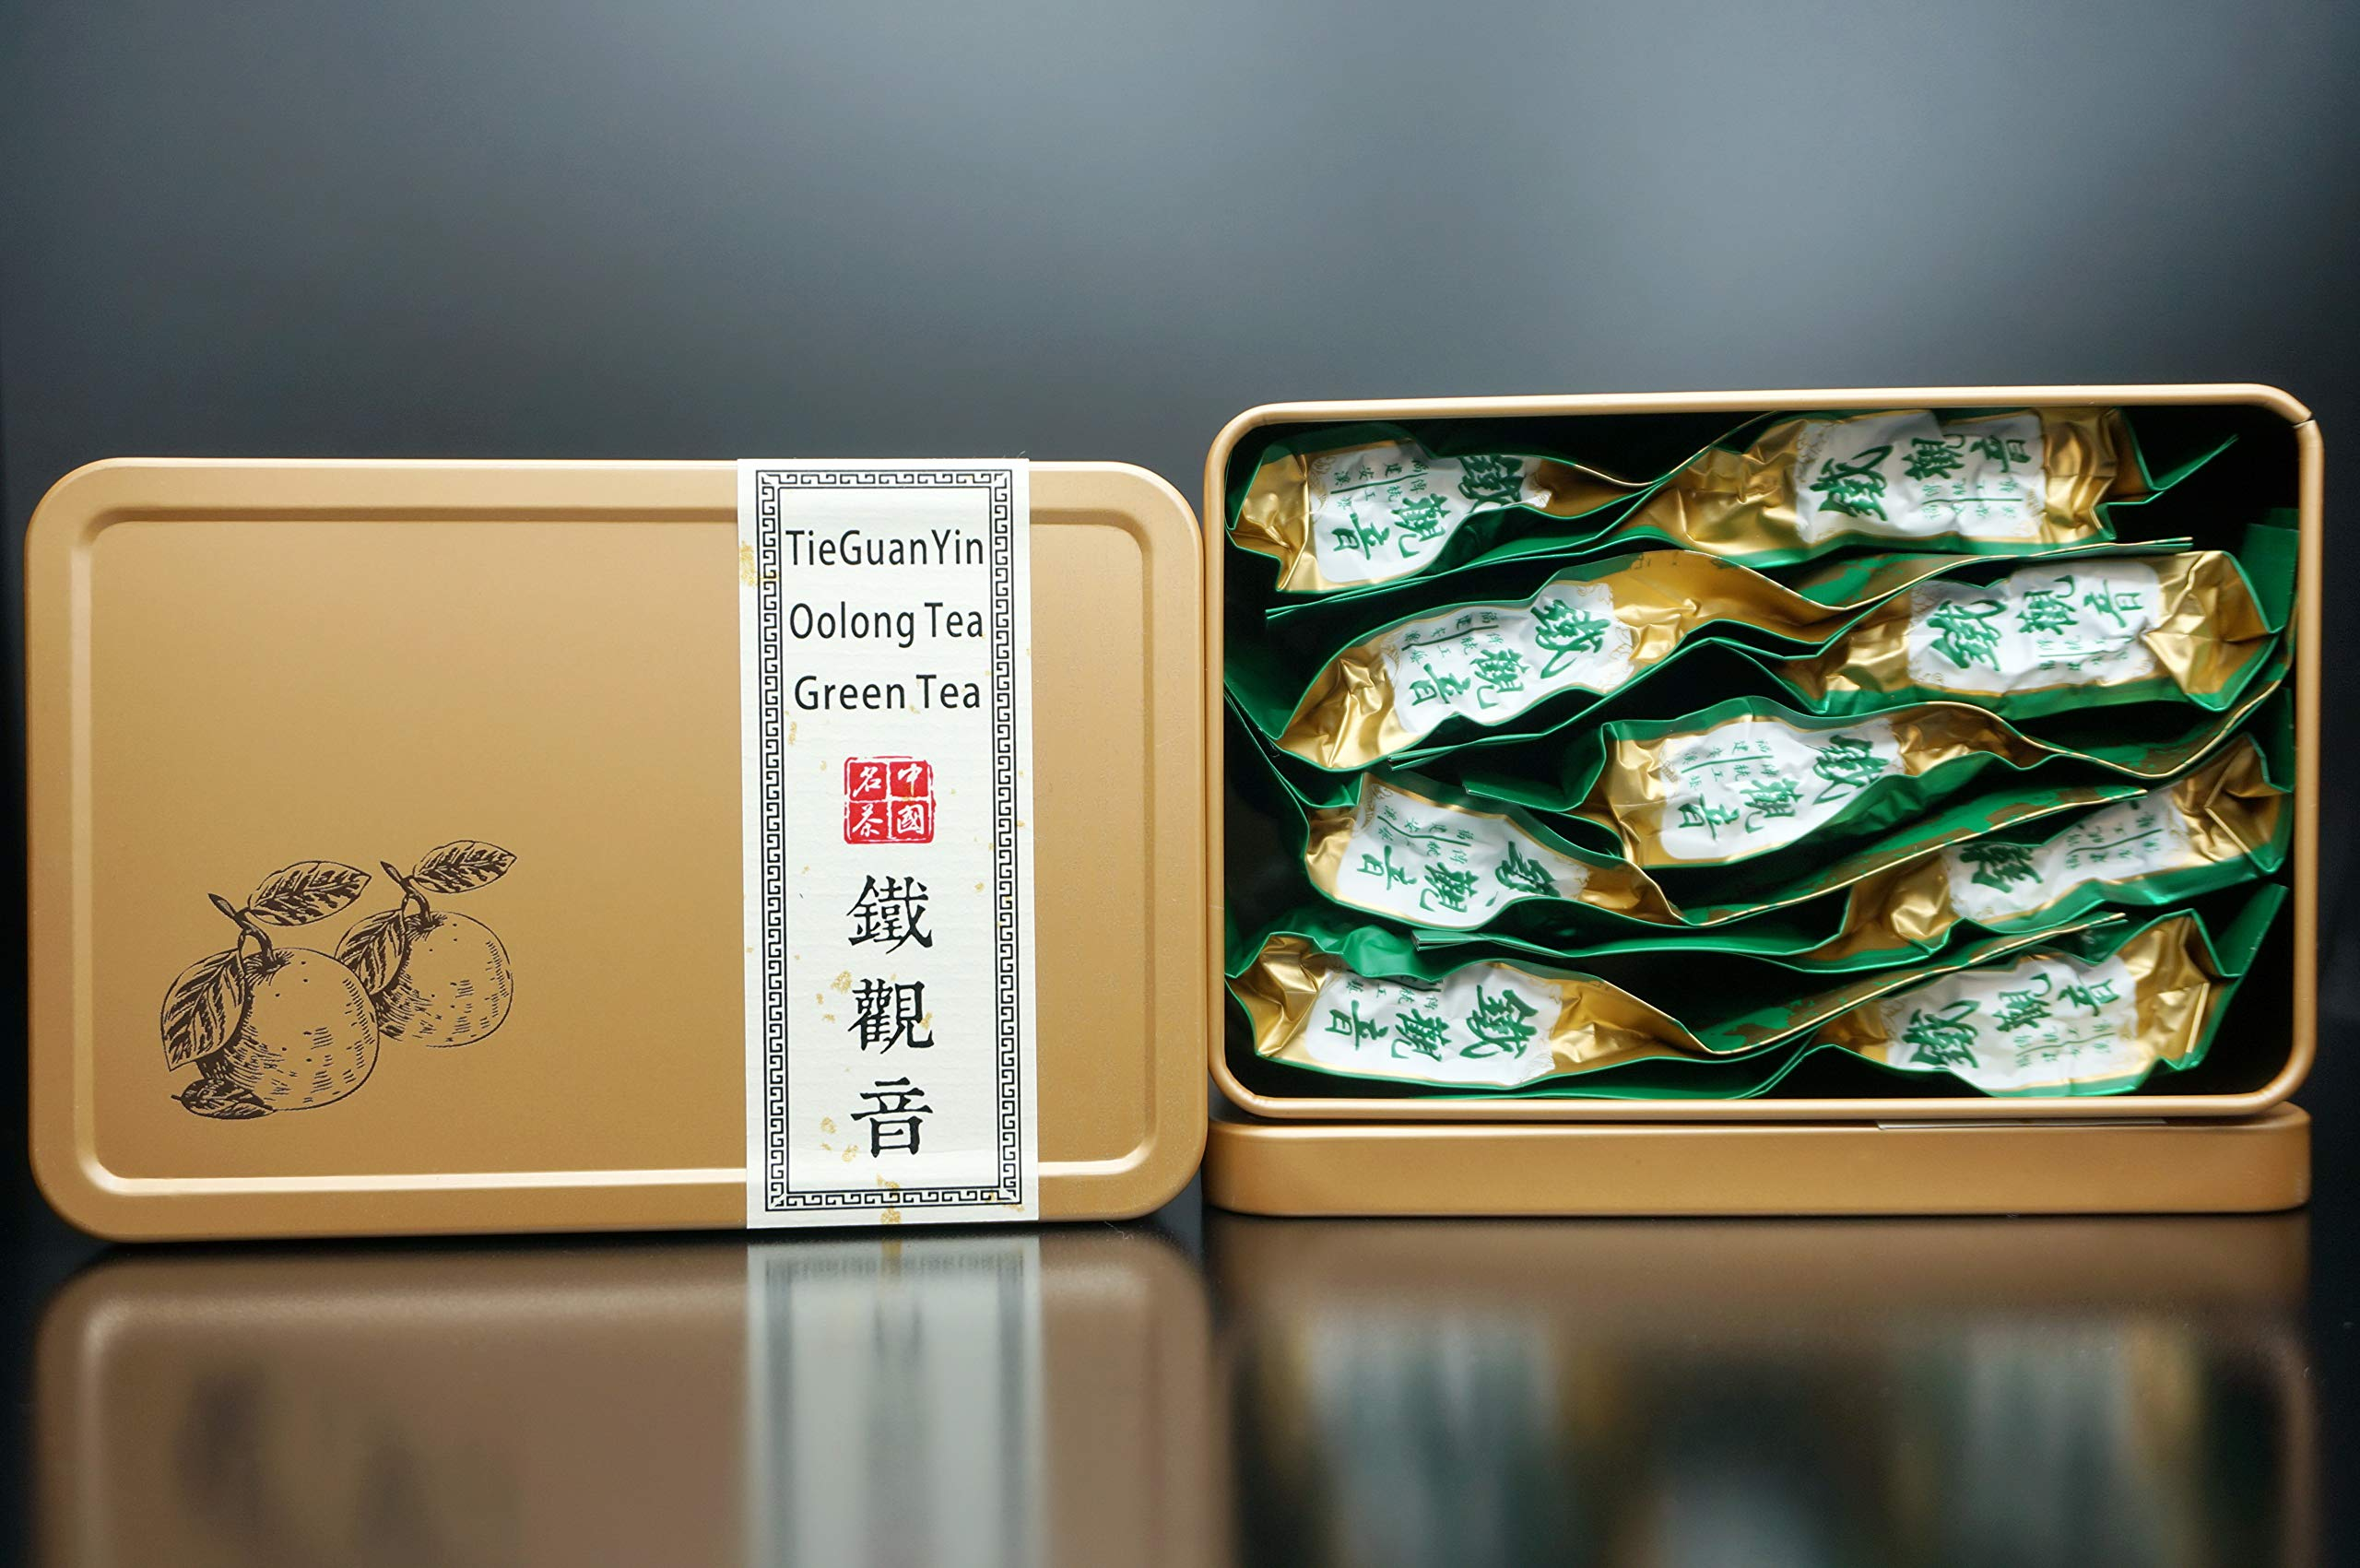 TieGuanYin.Tieguanyin.Oolong Tea.Green Tea.Tie GuanYin Tea.Tea Box.Chinese Oolong Tea.Tea Boxes.Produced in Fujian Anxi.铁观音.乌龙茶.茶叶.